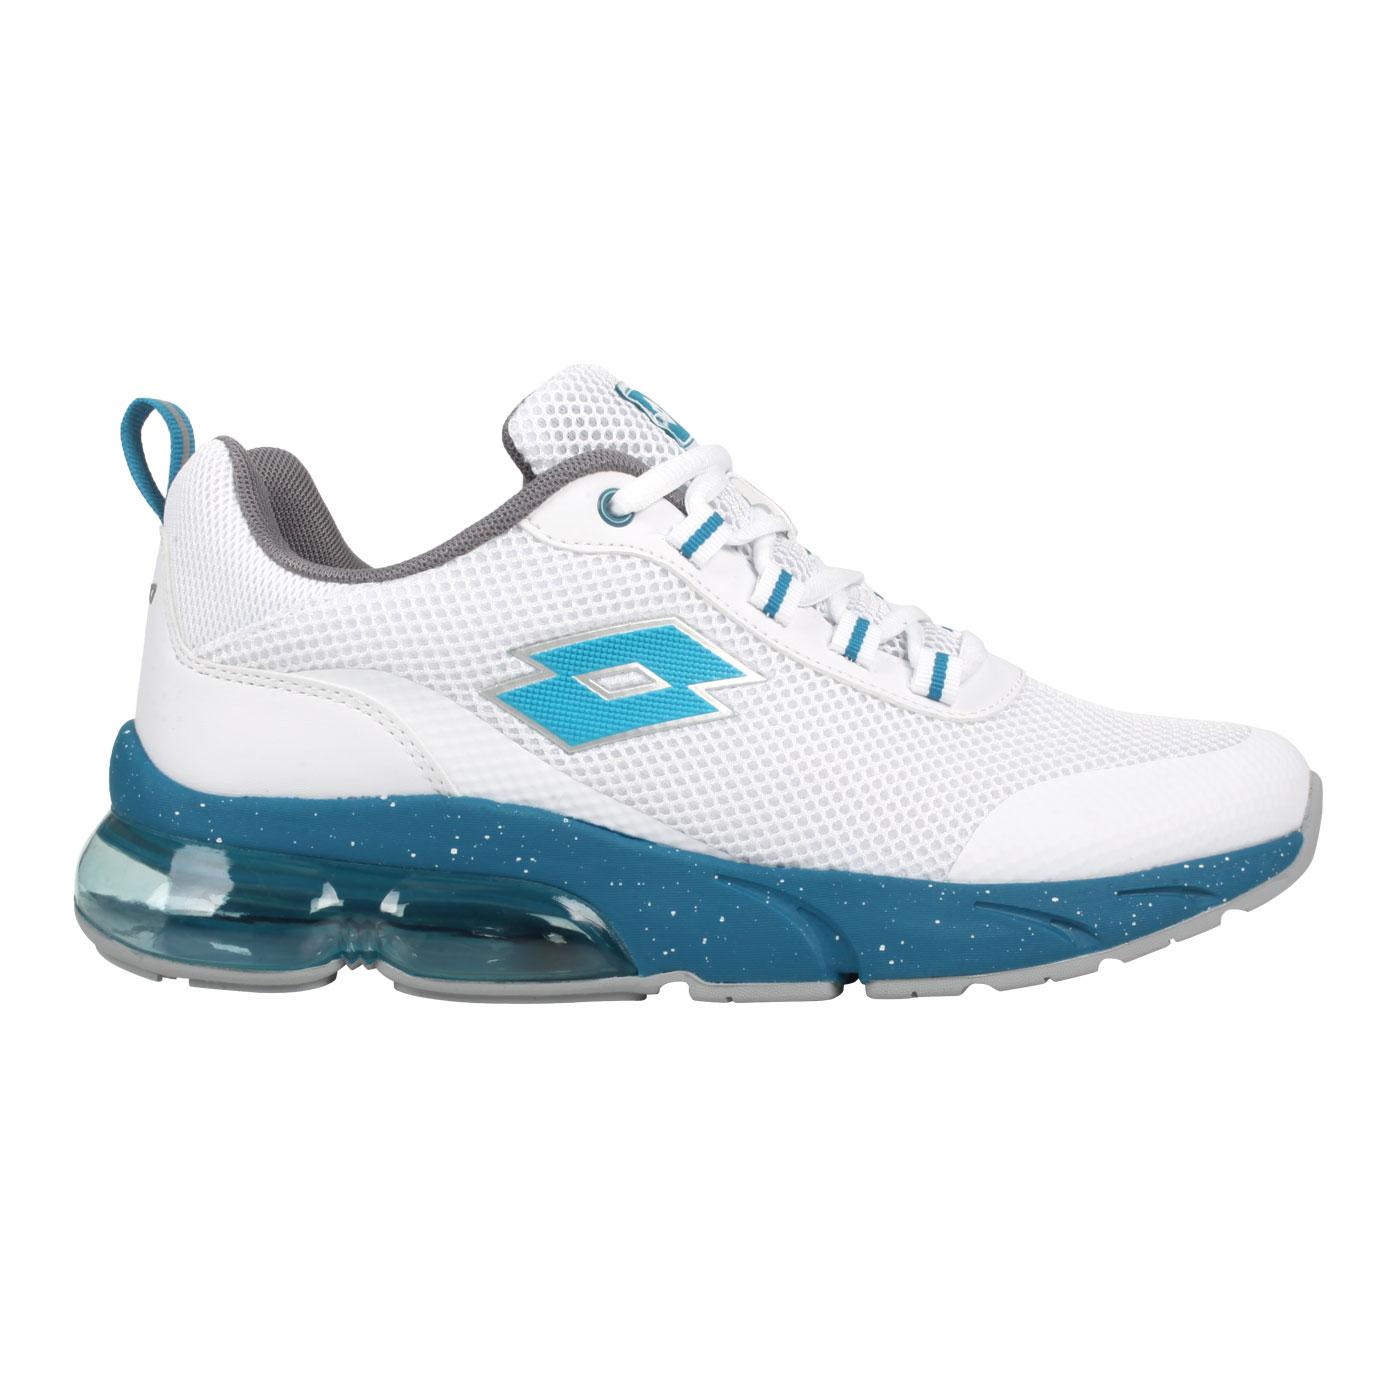 LOTTO 男款氣墊跑鞋 LT1AMR3026 - 白藍綠